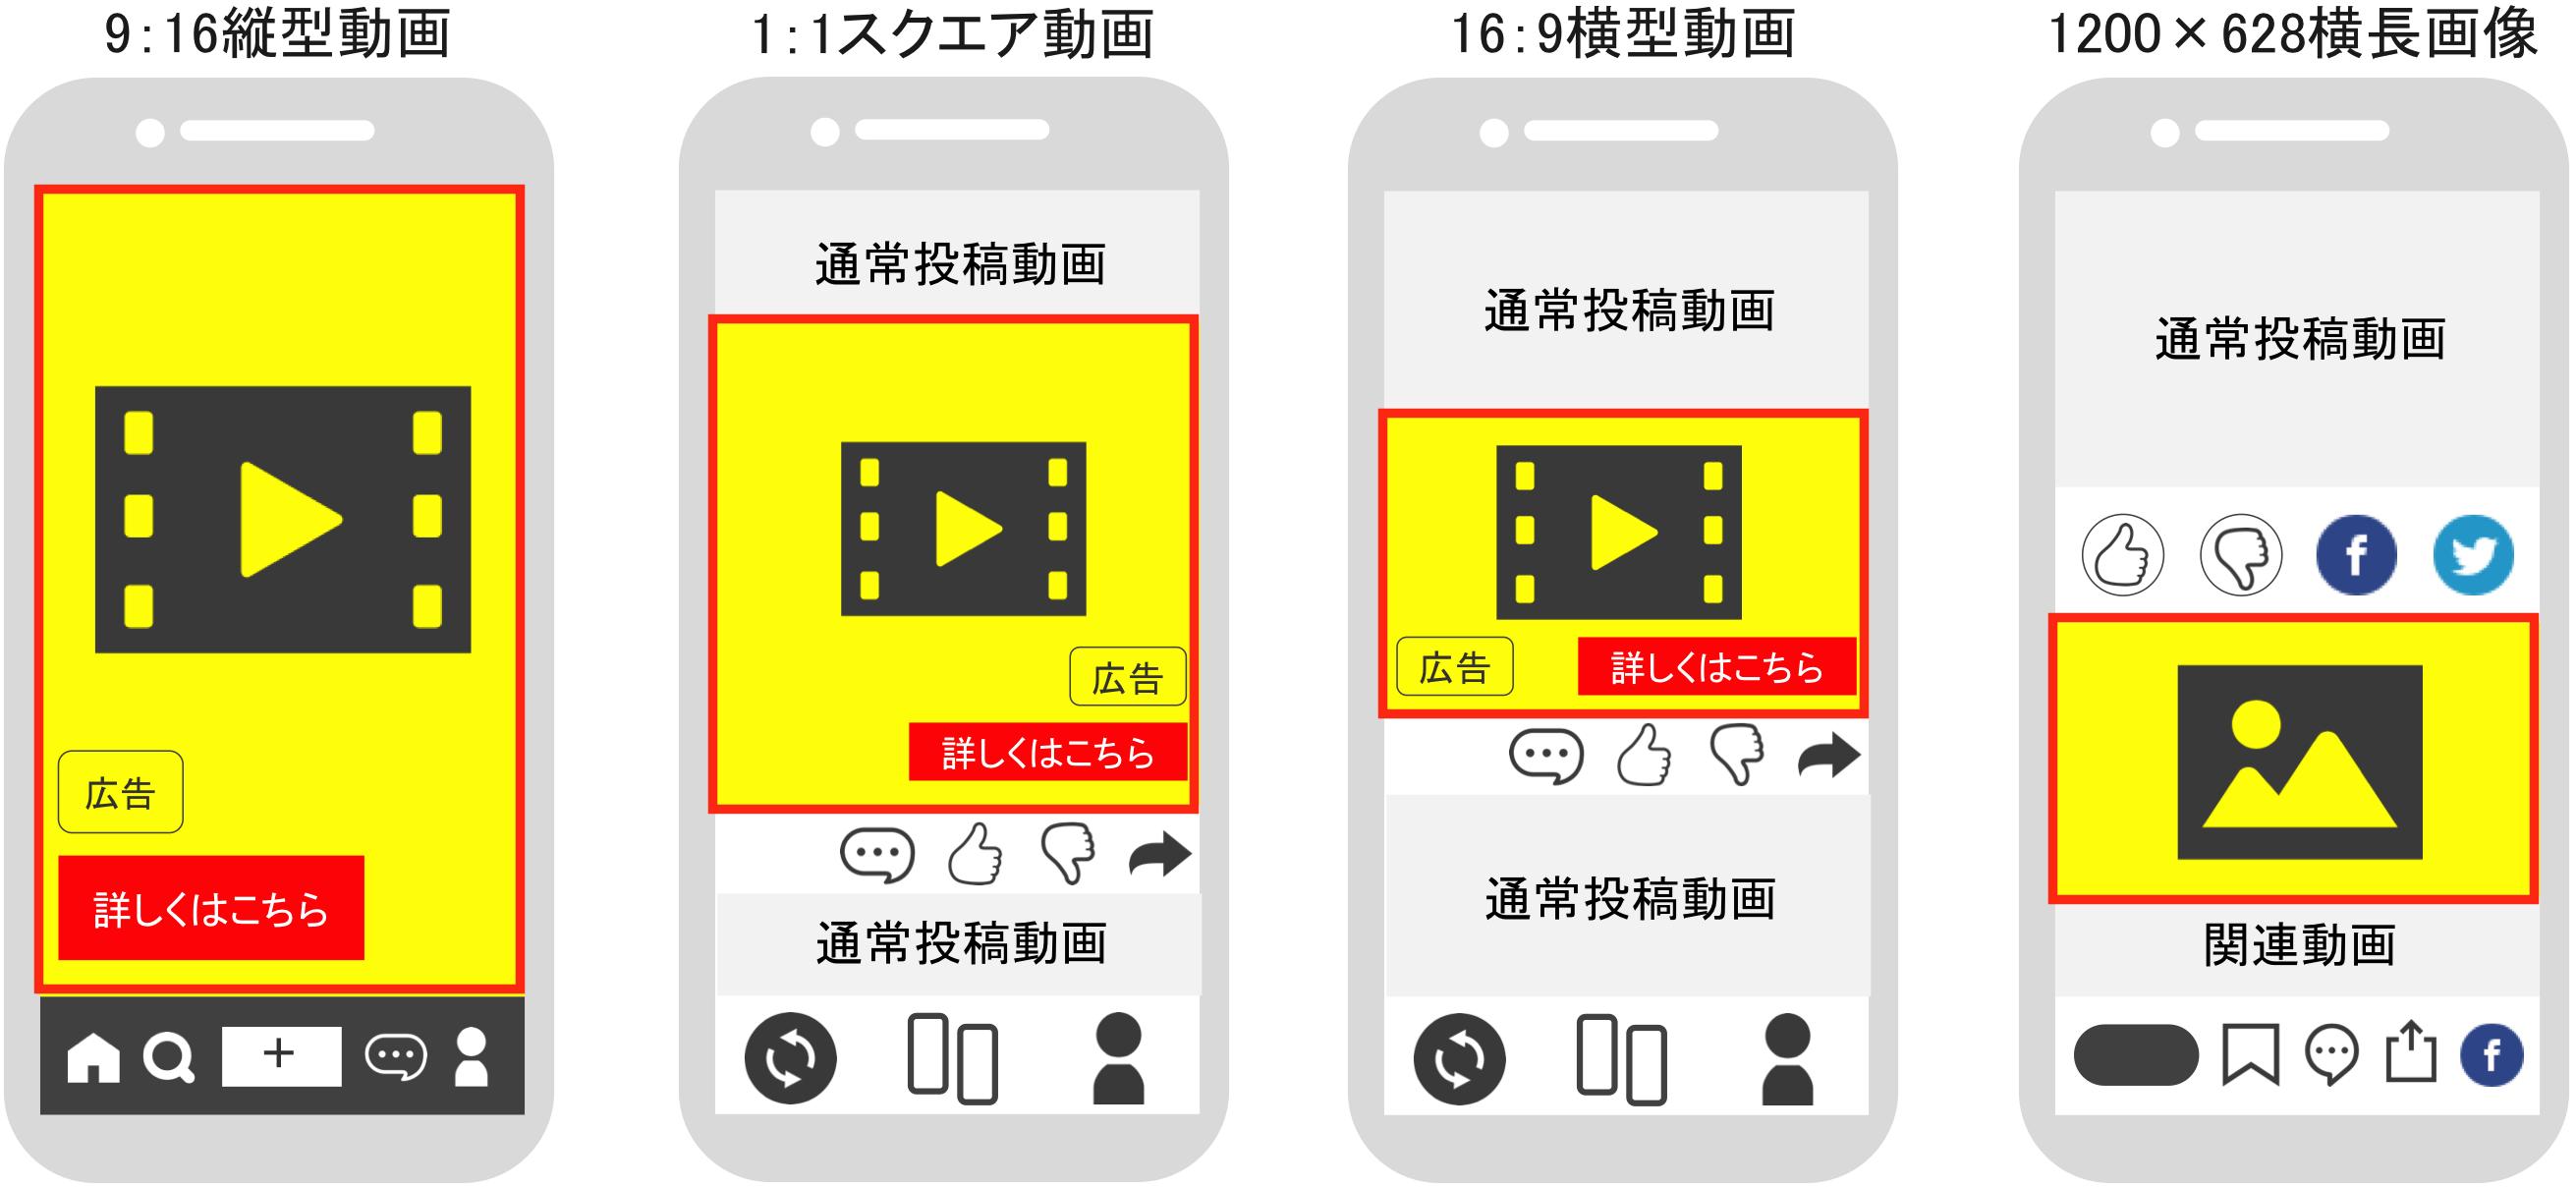 TikTokの運用型広告「TikTok Ads」の広告フォーマット一覧